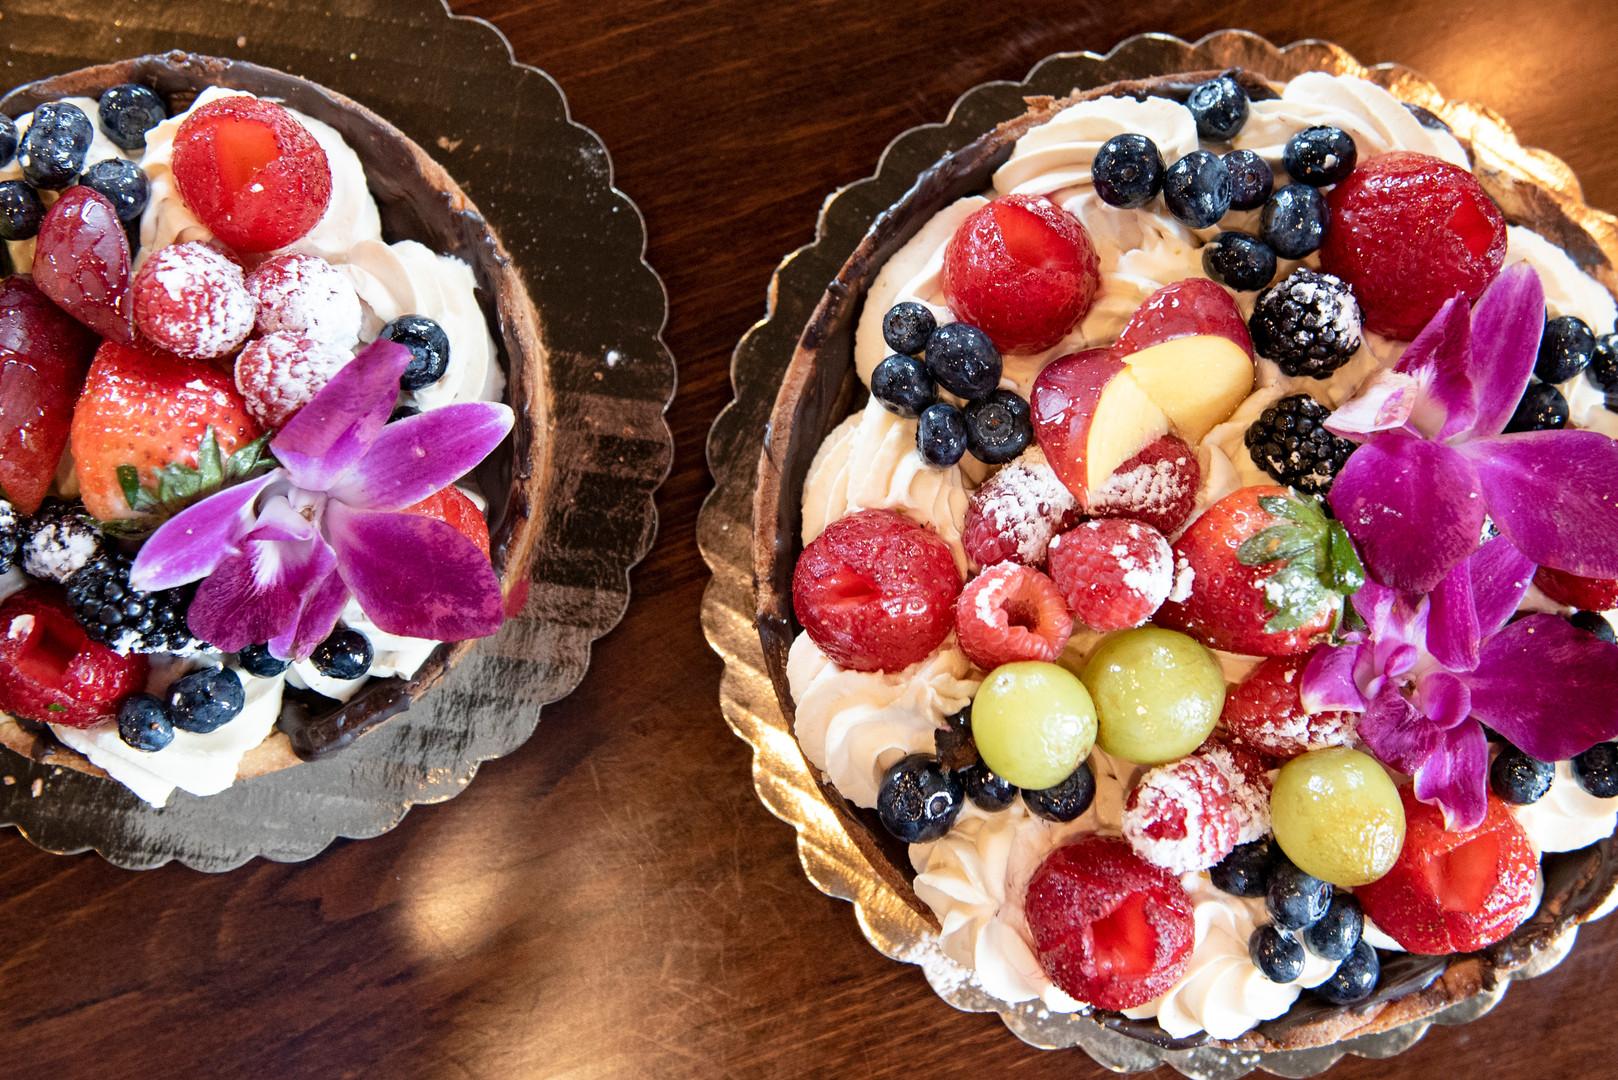 Chantilly Fruit Cake